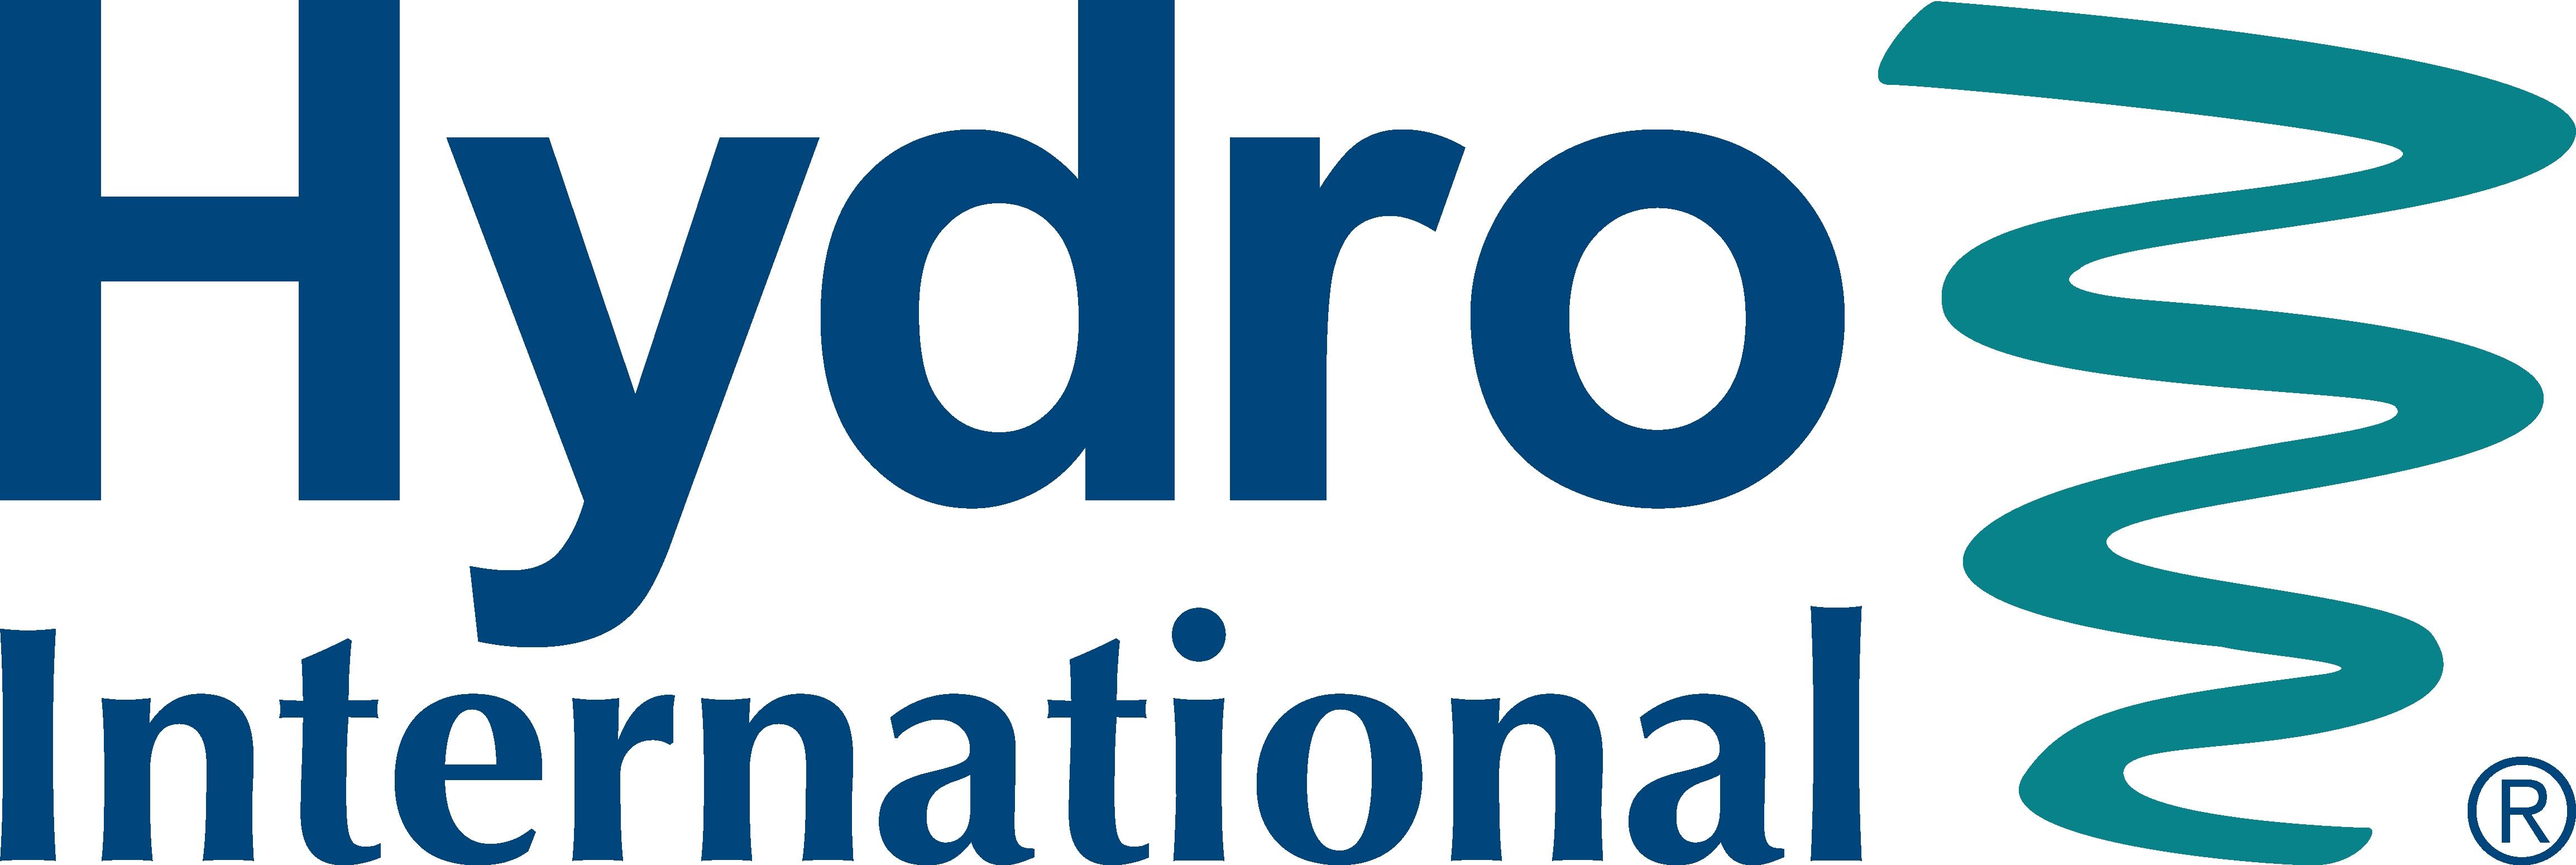 Hydro International